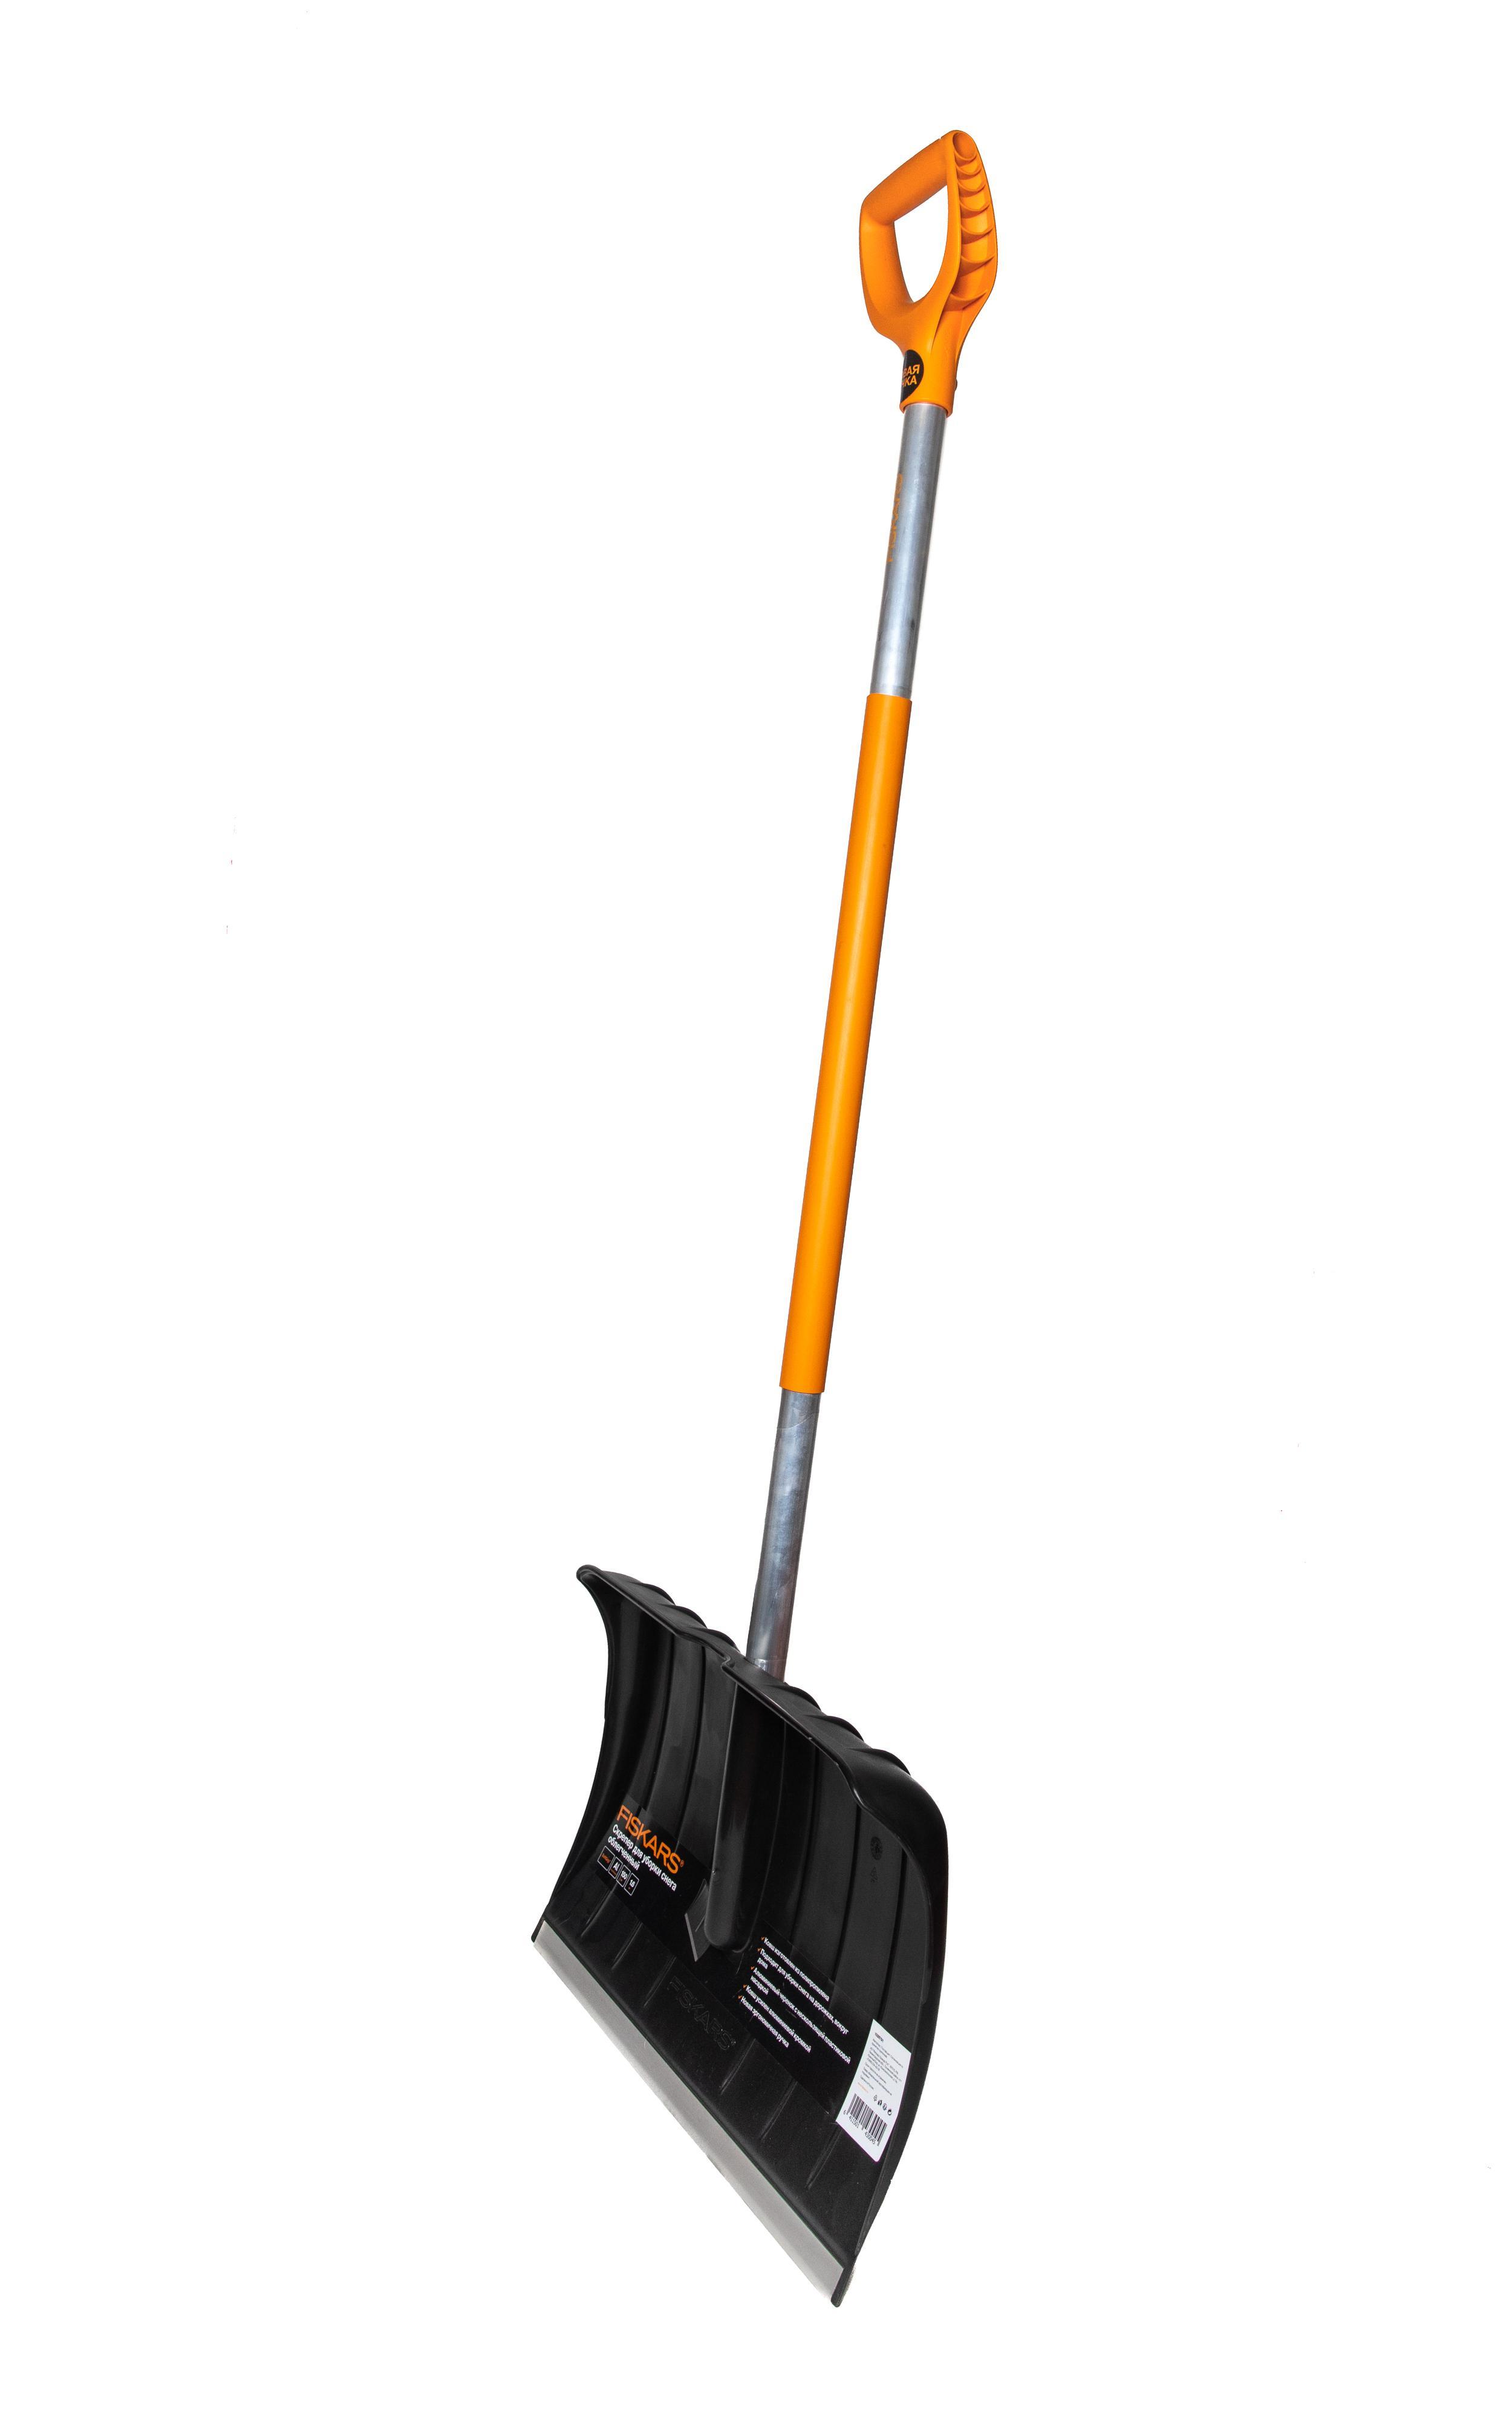 Скрепер для снега Fiskars 143001 скрепер для уборки снега fiskars snowxpert 143001